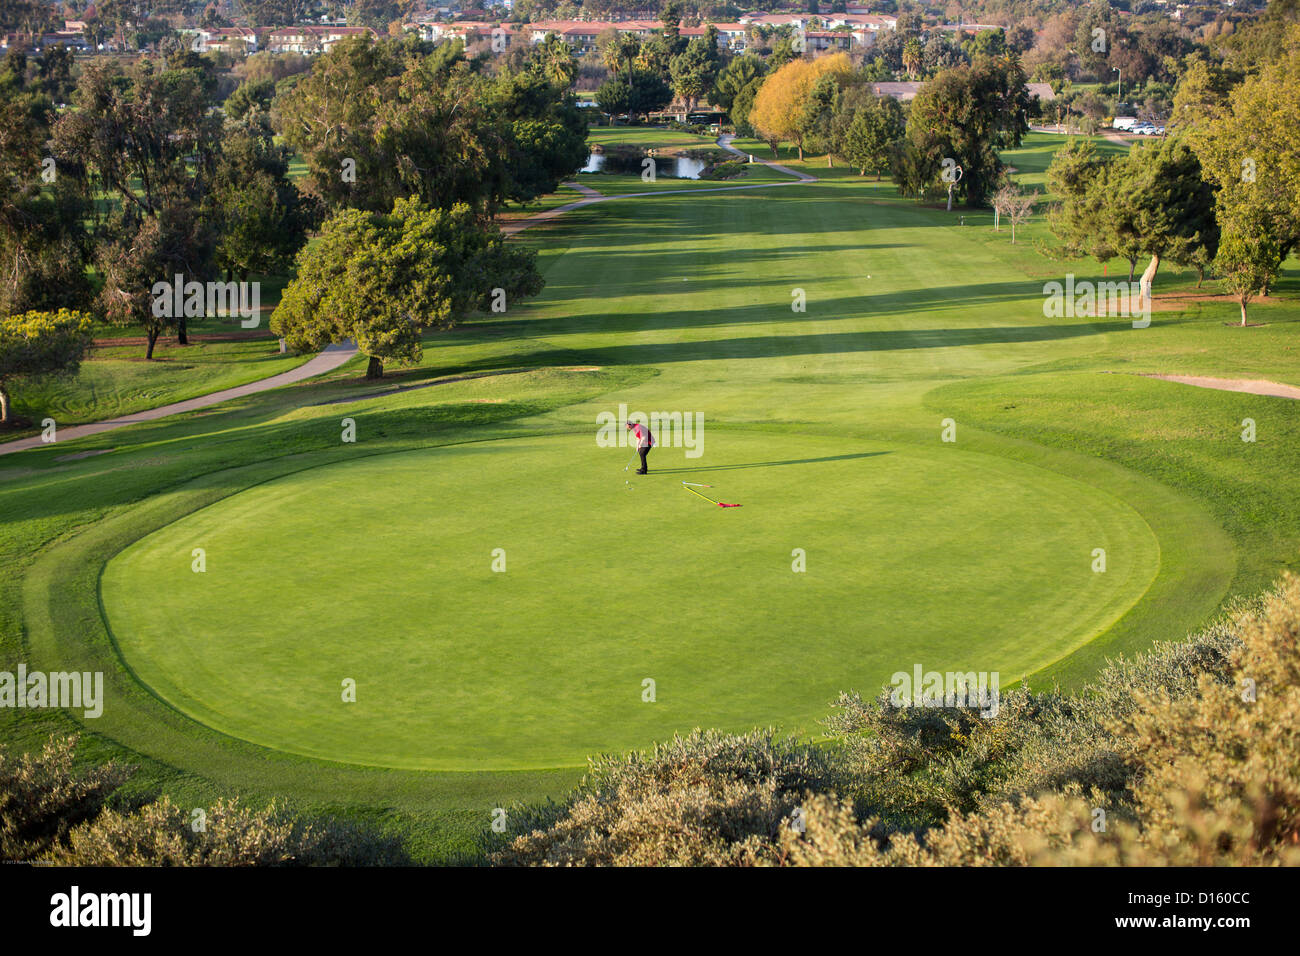 Un giocatore di golf putt su un verde al San Juan Hills golf in San Juan Capistrano, California. Immagini Stock